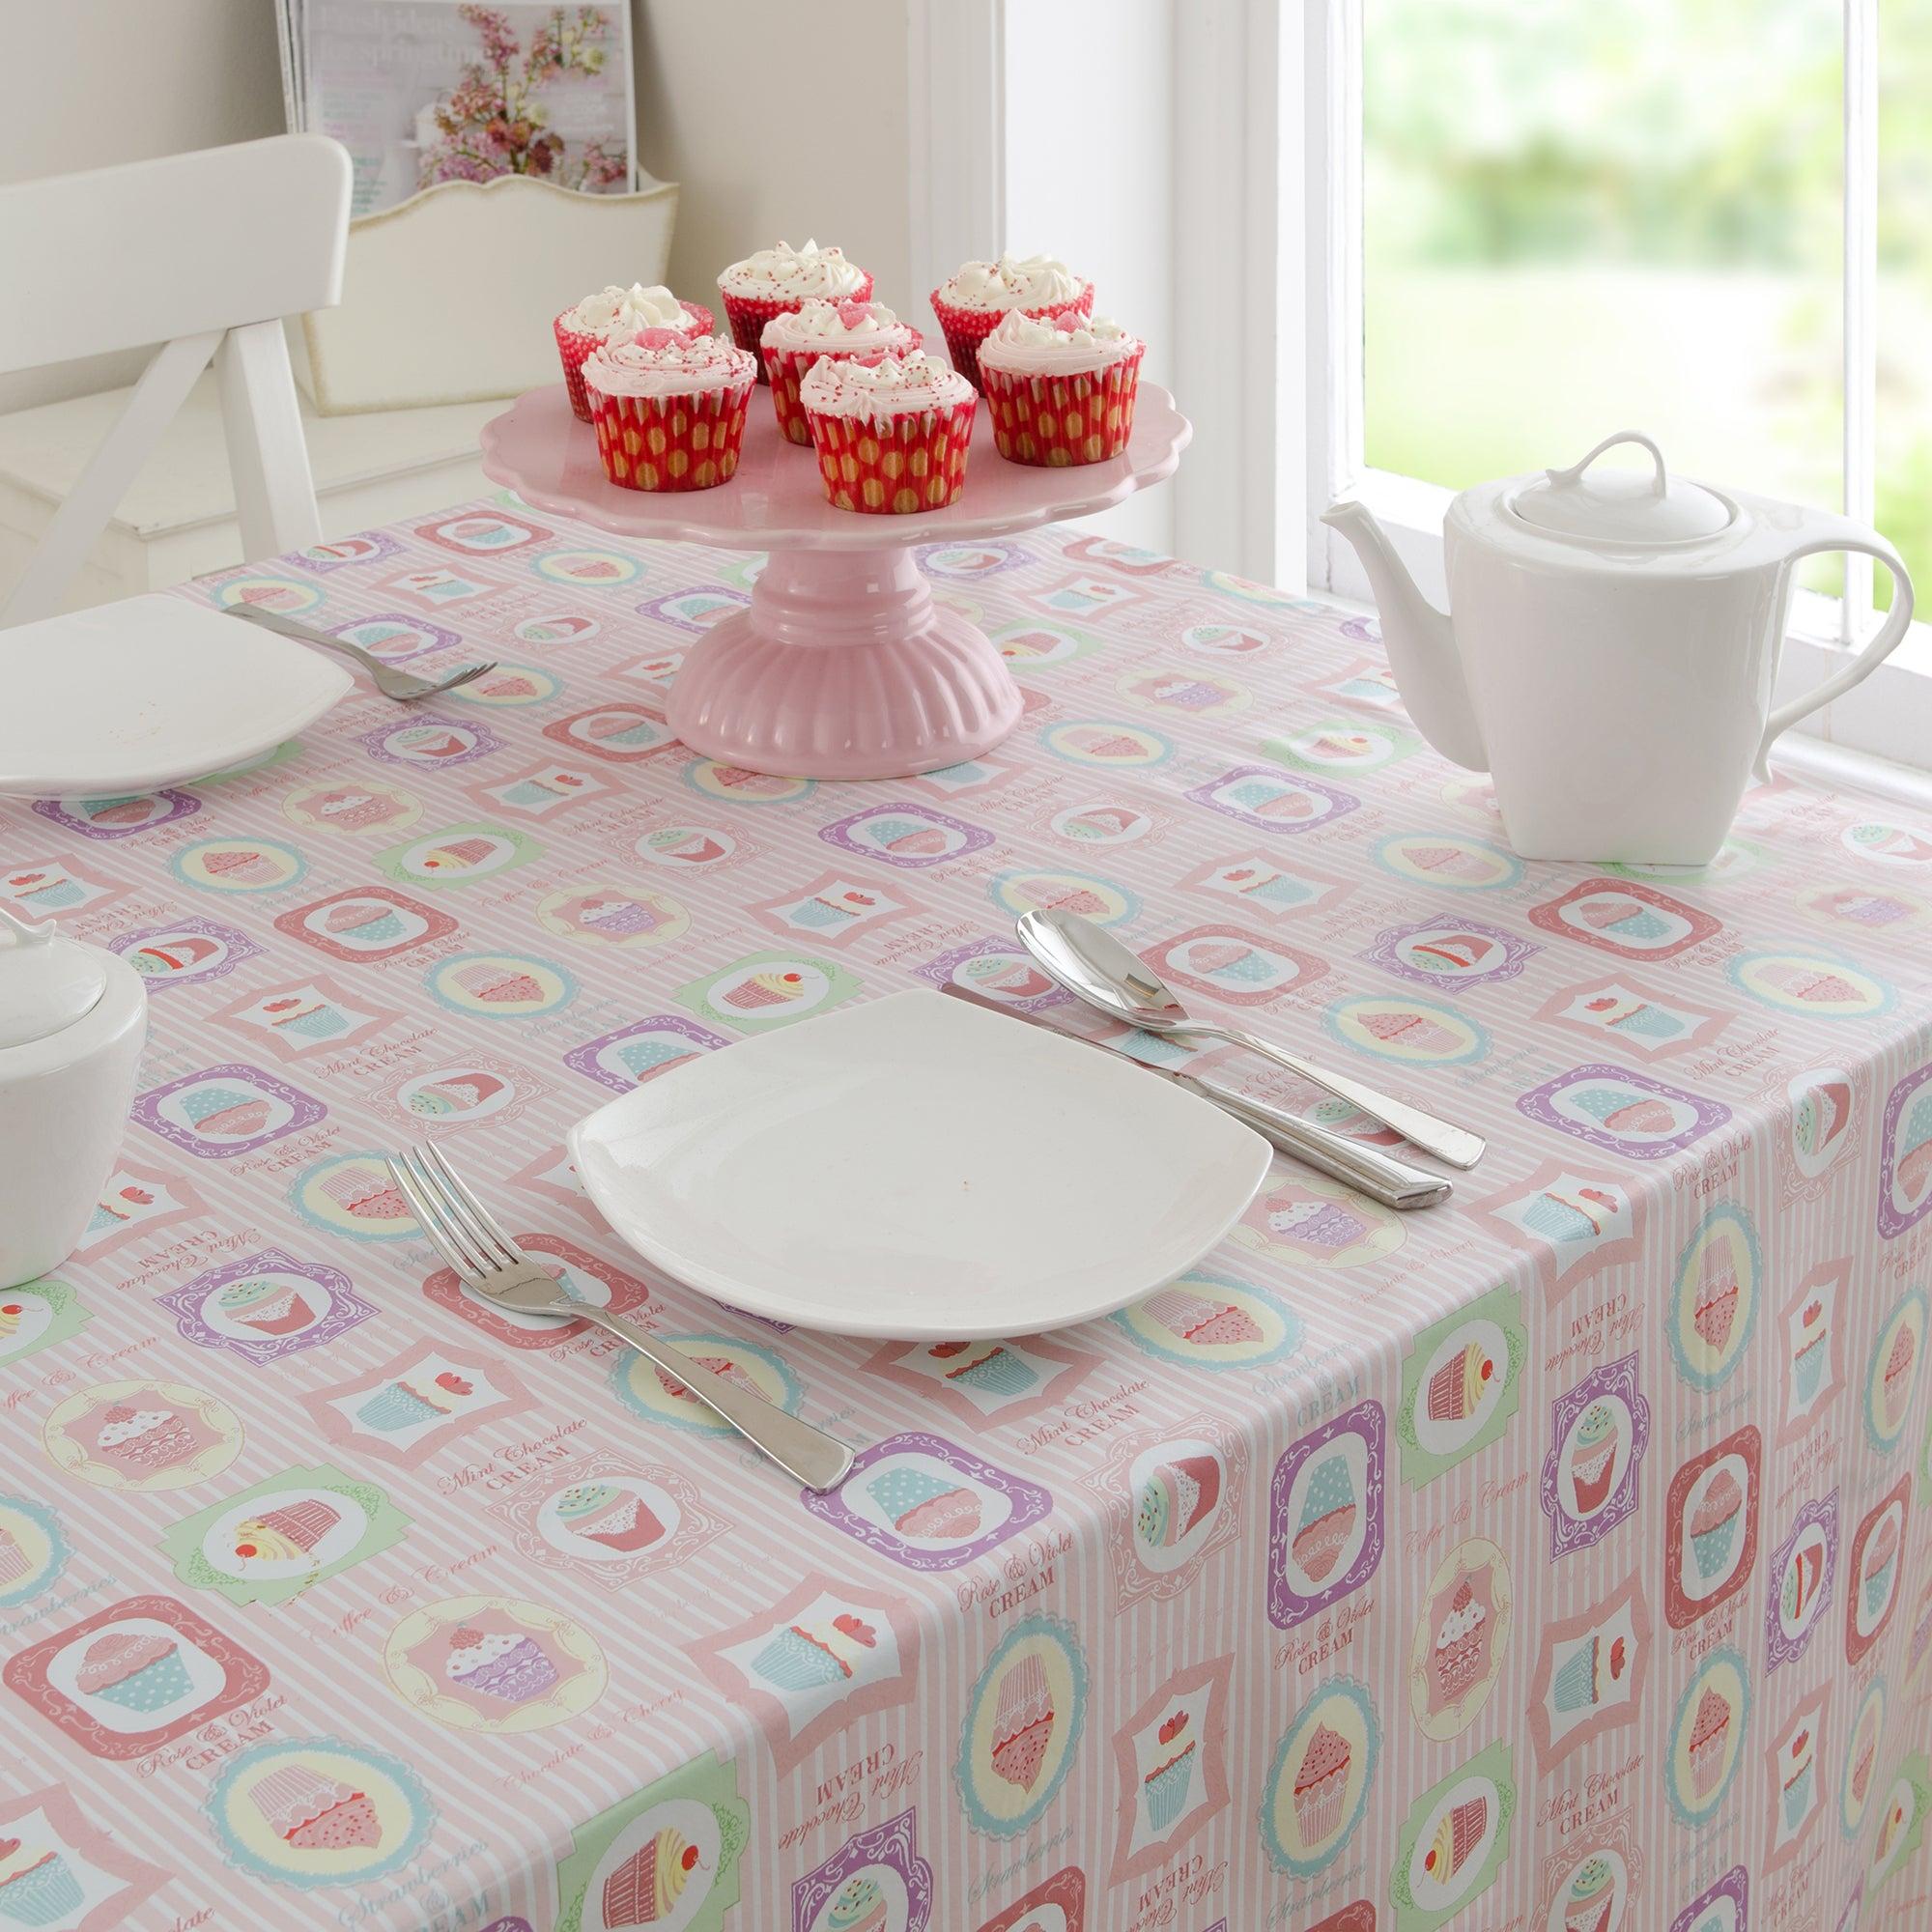 Tea Party Round PVC Tablecloth